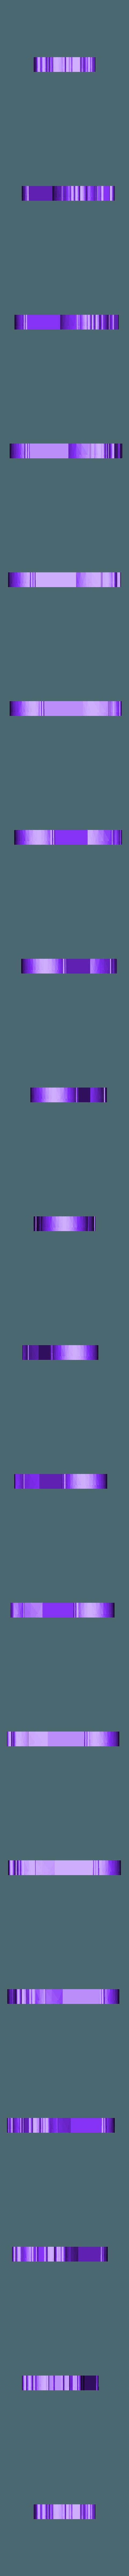 Minons.STL Download STL file Biscuit Cutter-Minions • Model to 3D print, deyson20